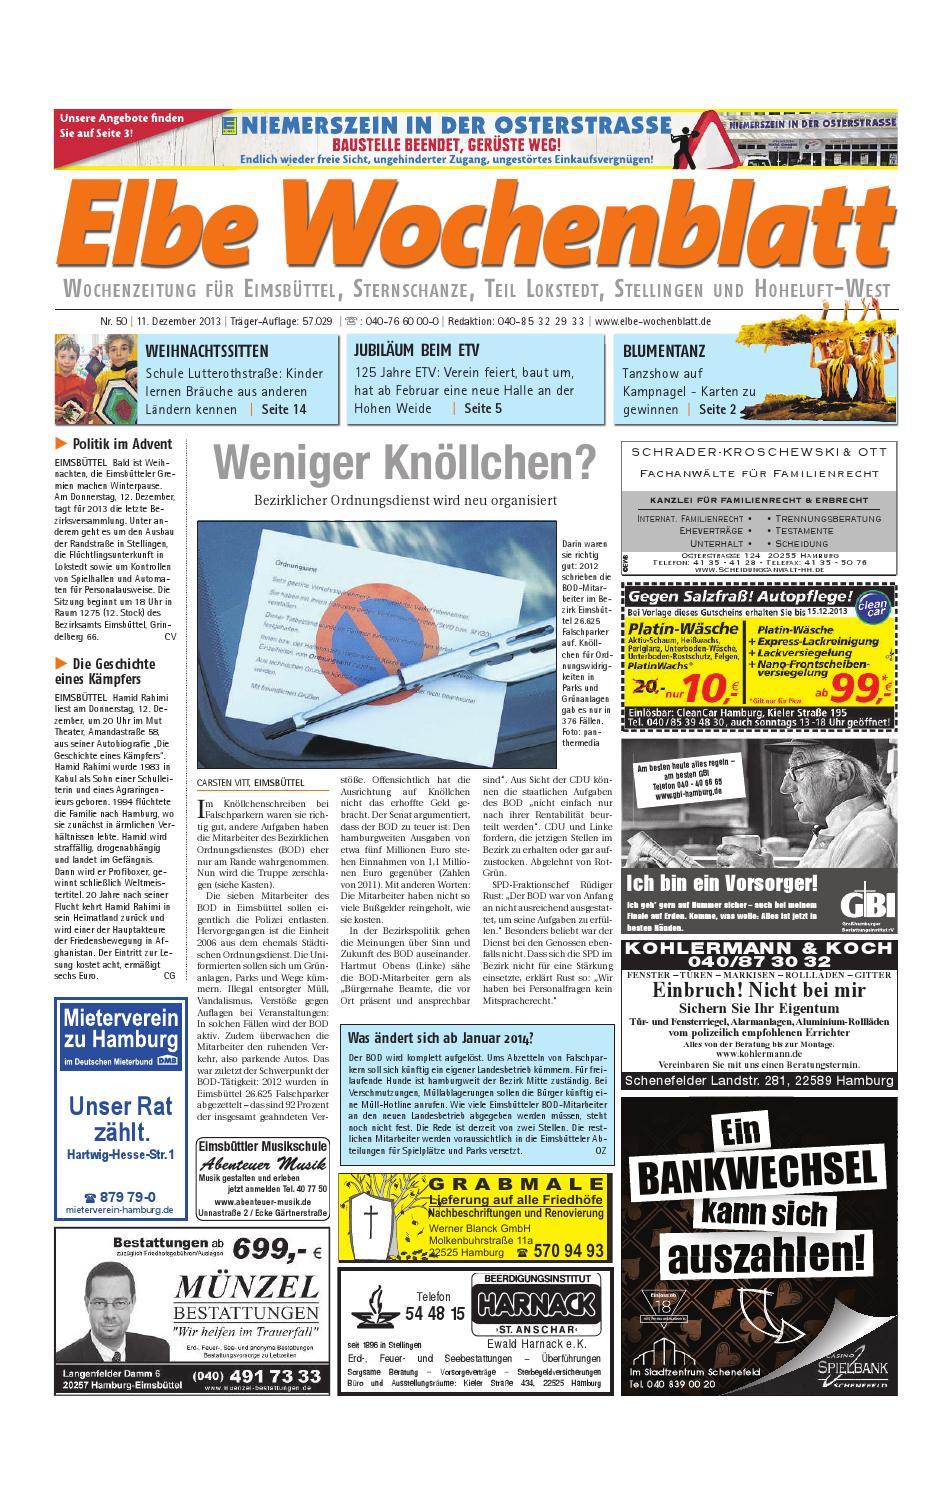 Eimsbüttel KW50 2013 by Elbe Wochenblatt Verlagsgesellschaft